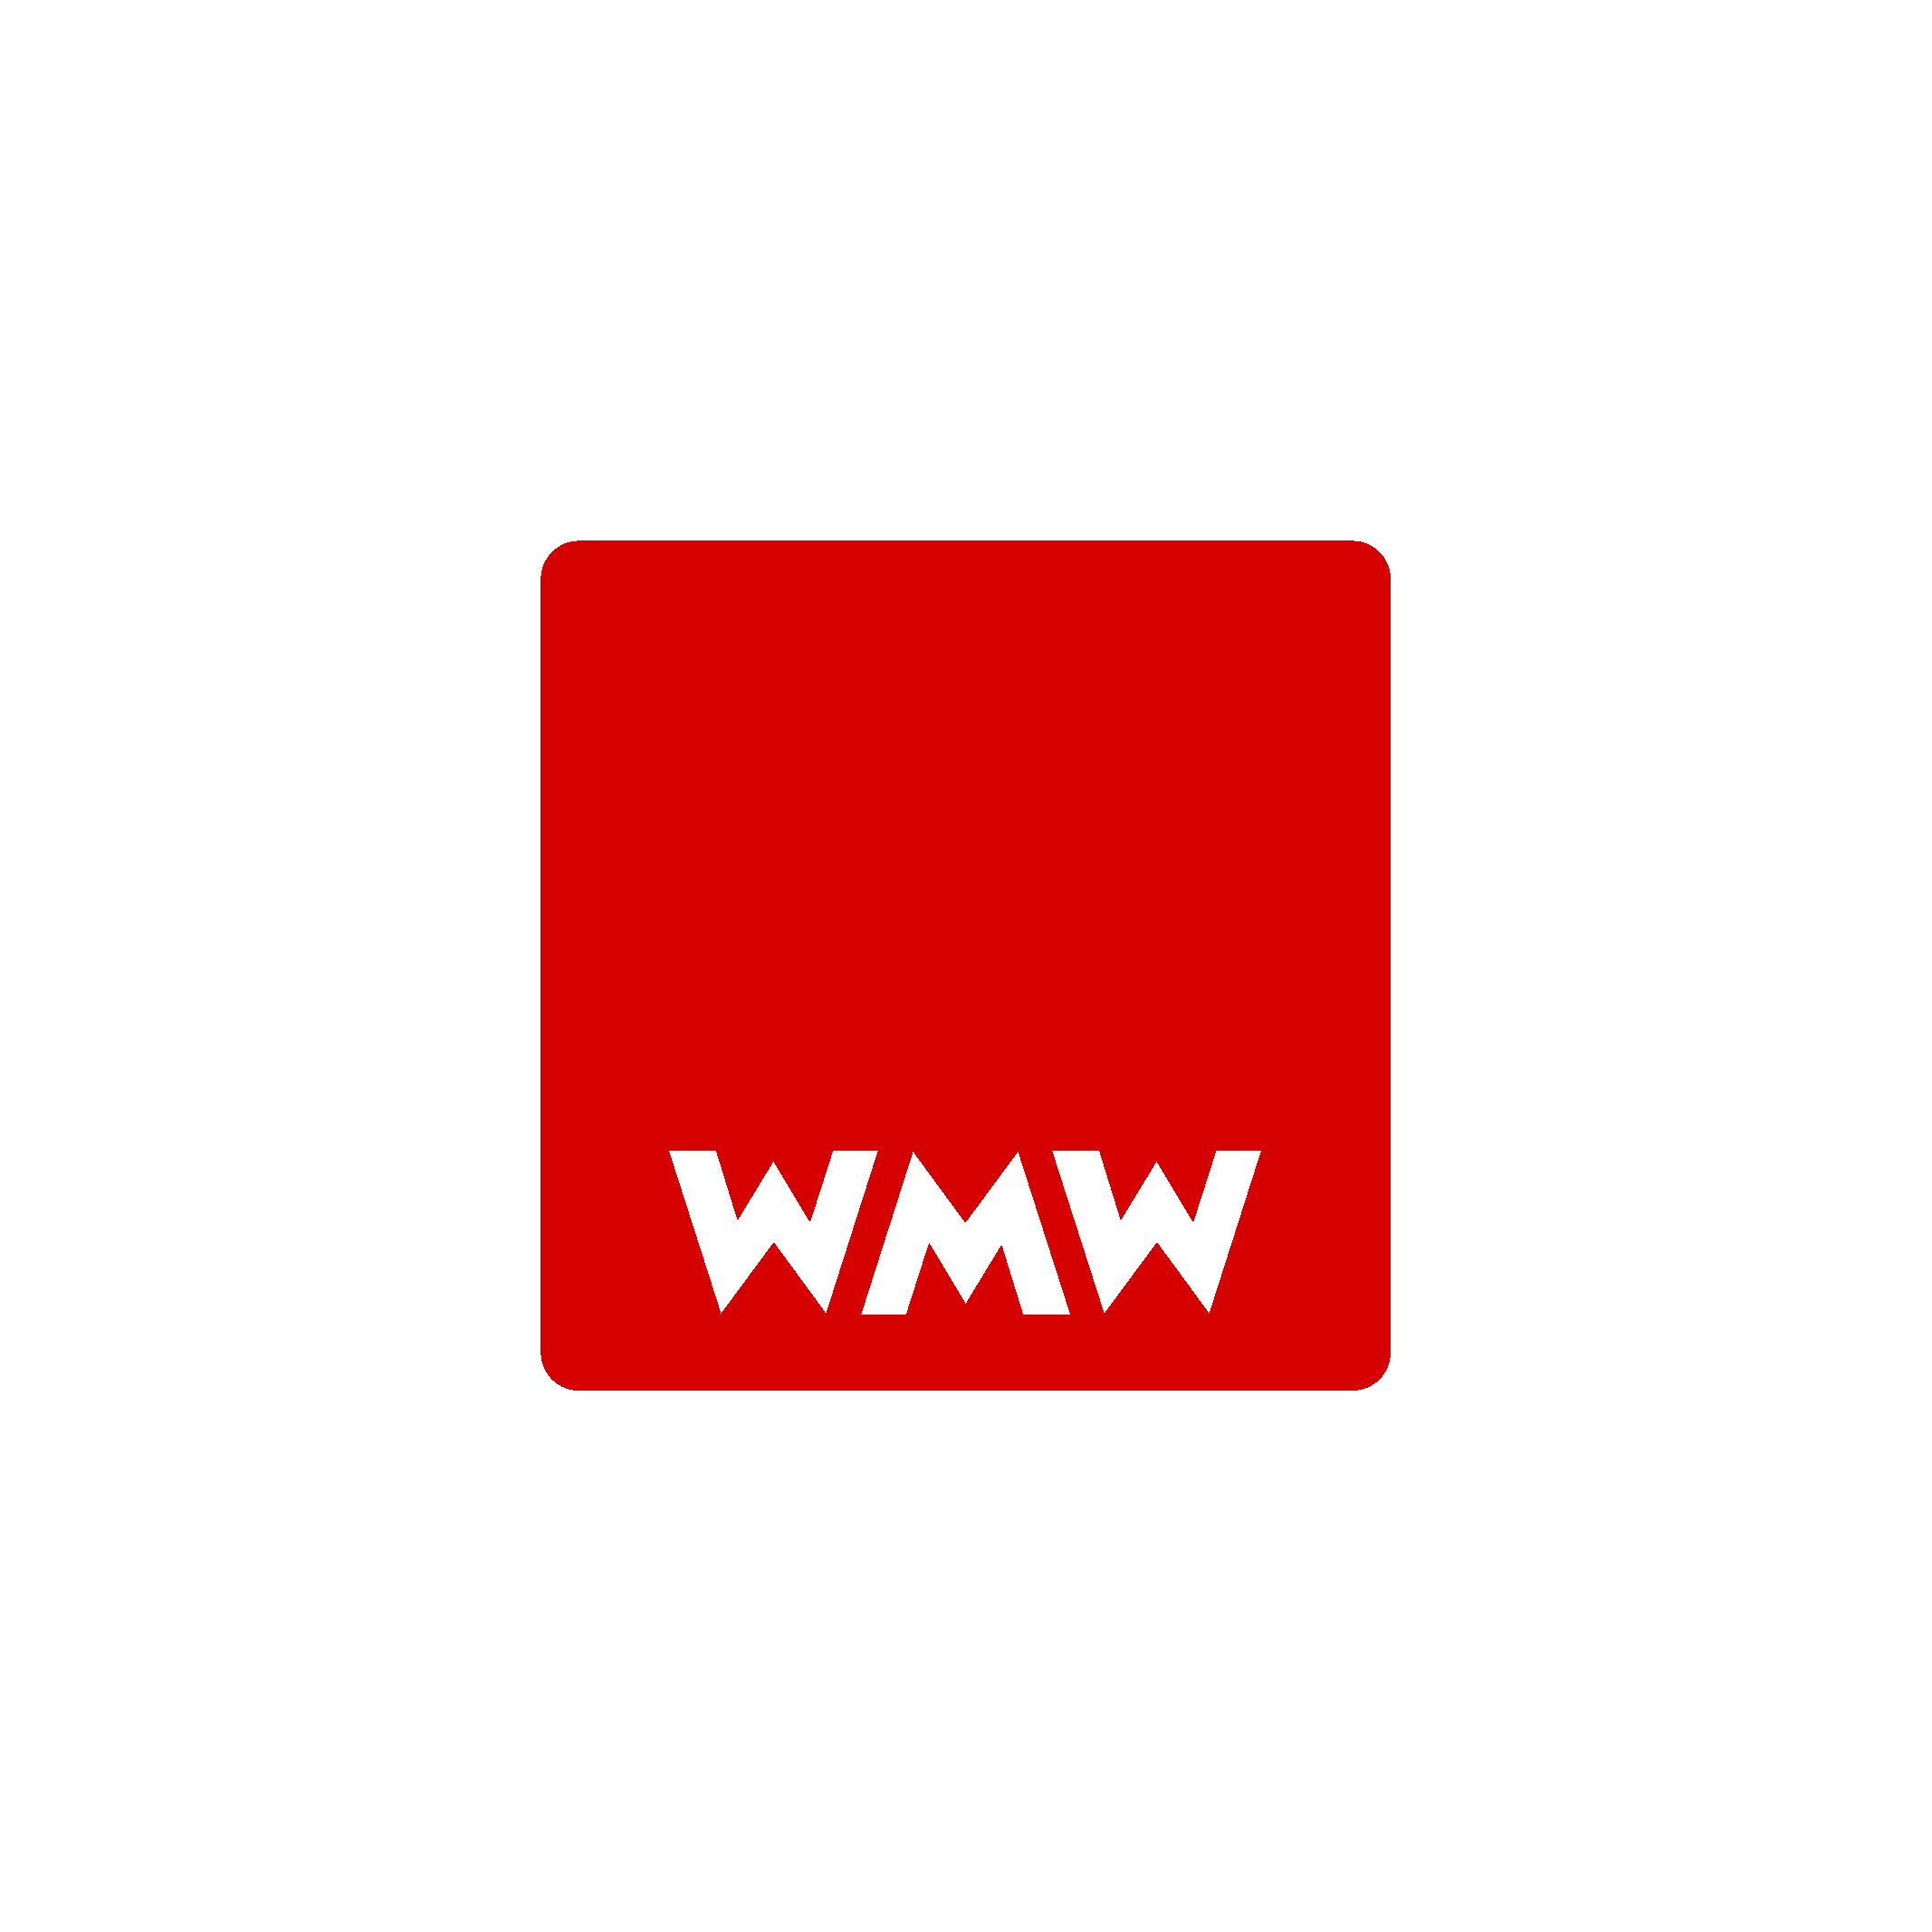 https://www.influxmediahouse.com/wp-content/uploads/2019/01/Logo_WMW-colour.png